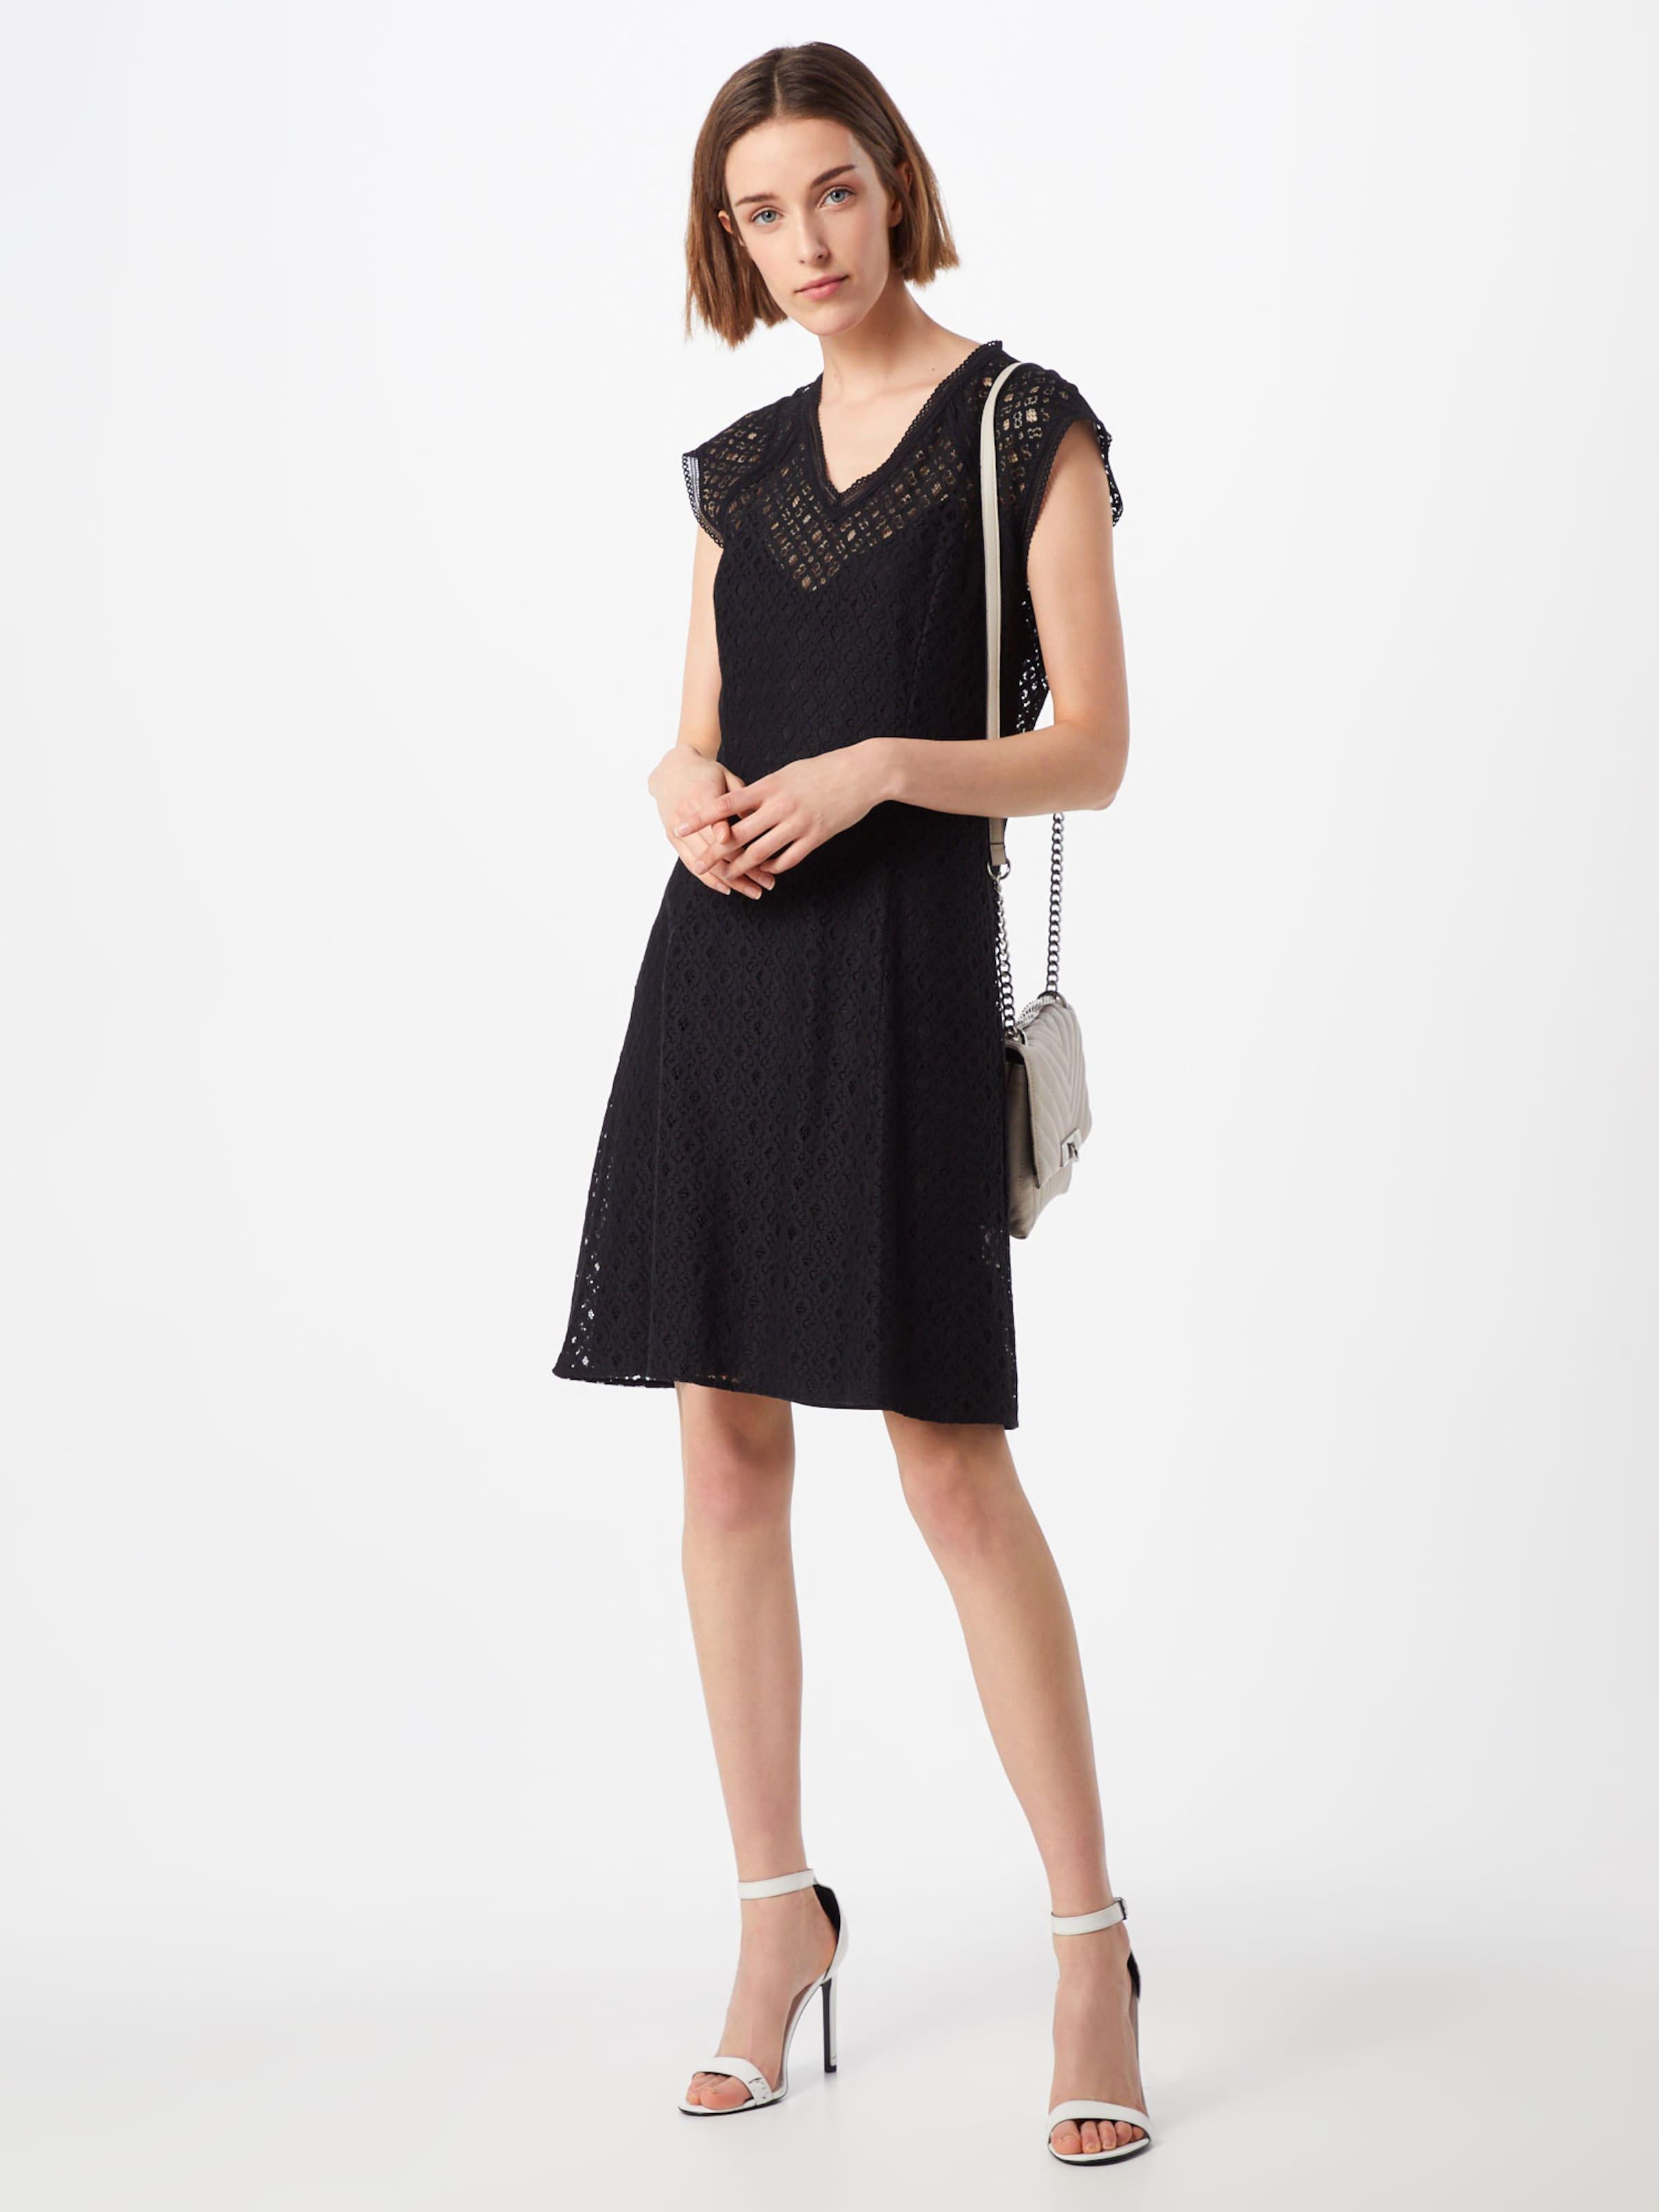 'dress Ss' Schwarz In Kleid Rosemunde Pv8mw0OyNn